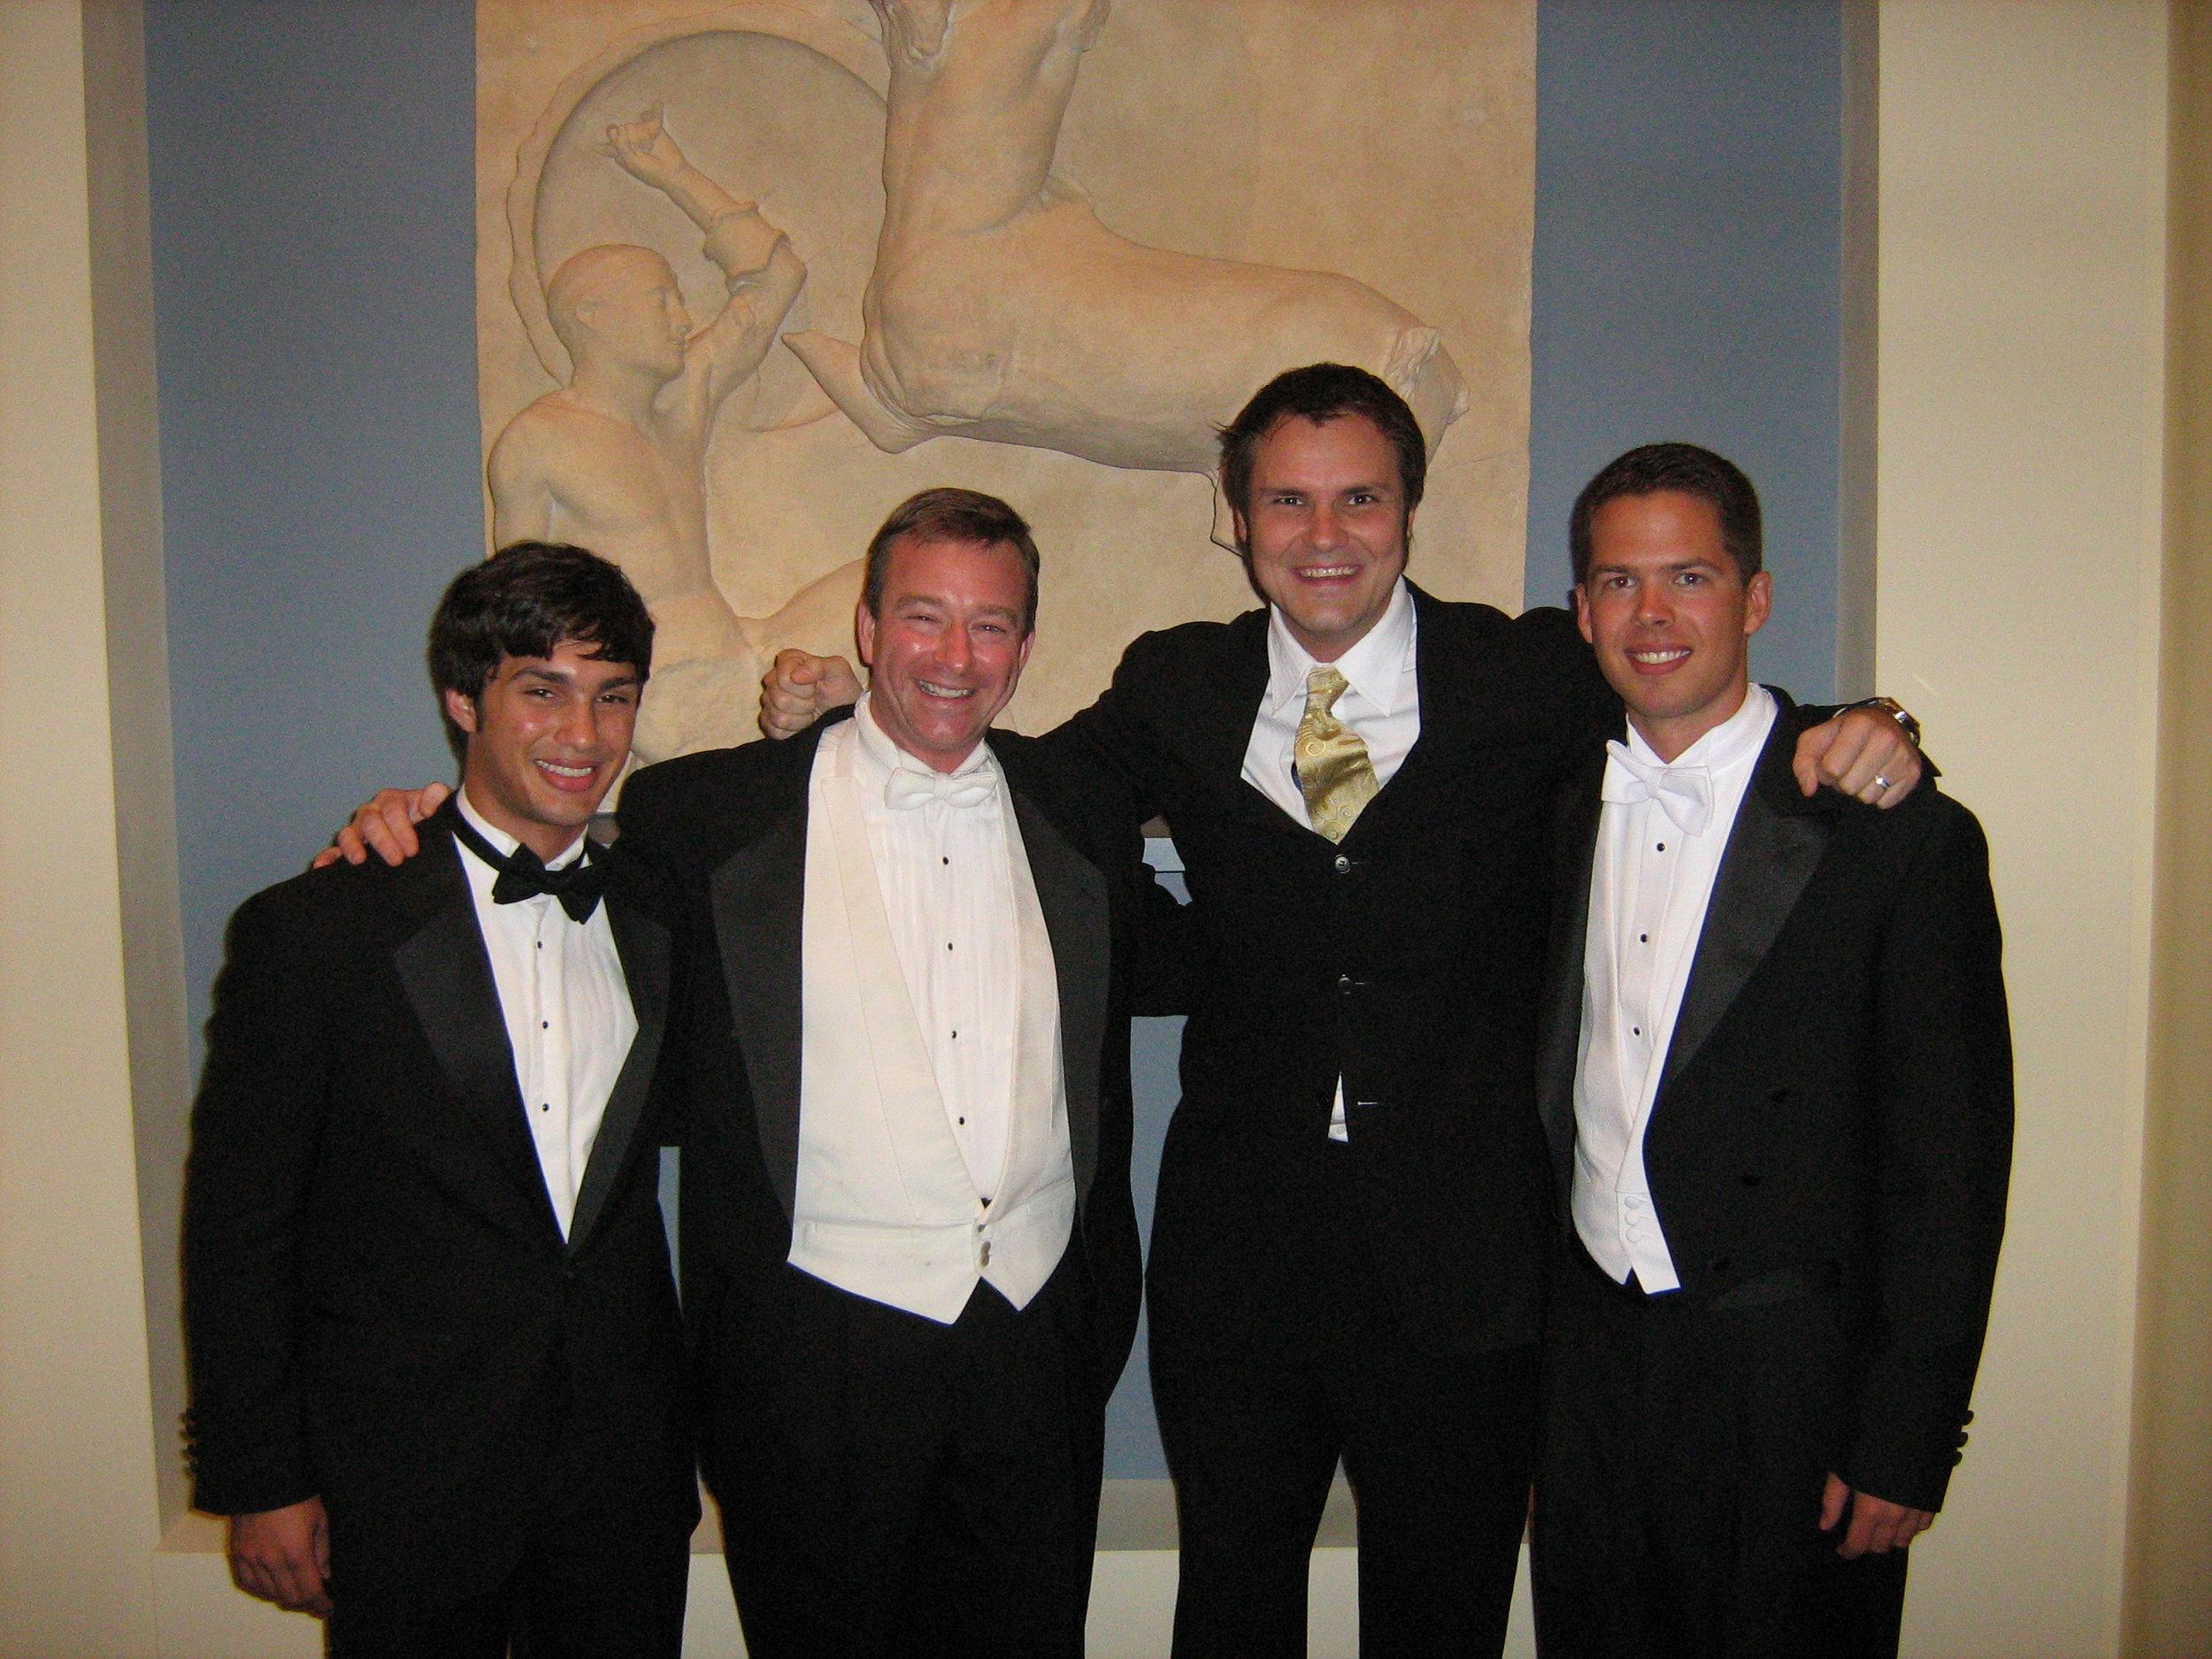 Kunal Lahiry, Jeff Nelsen, and Will Pitts.JPG